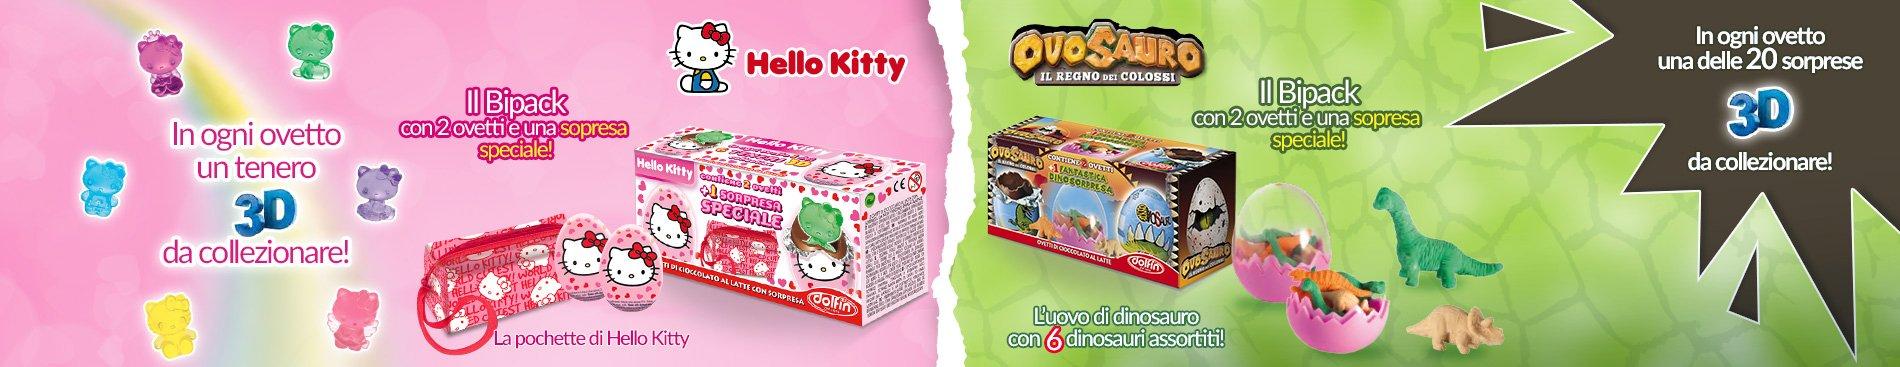 2016 BiPack Hello Kitty - Ovosauro